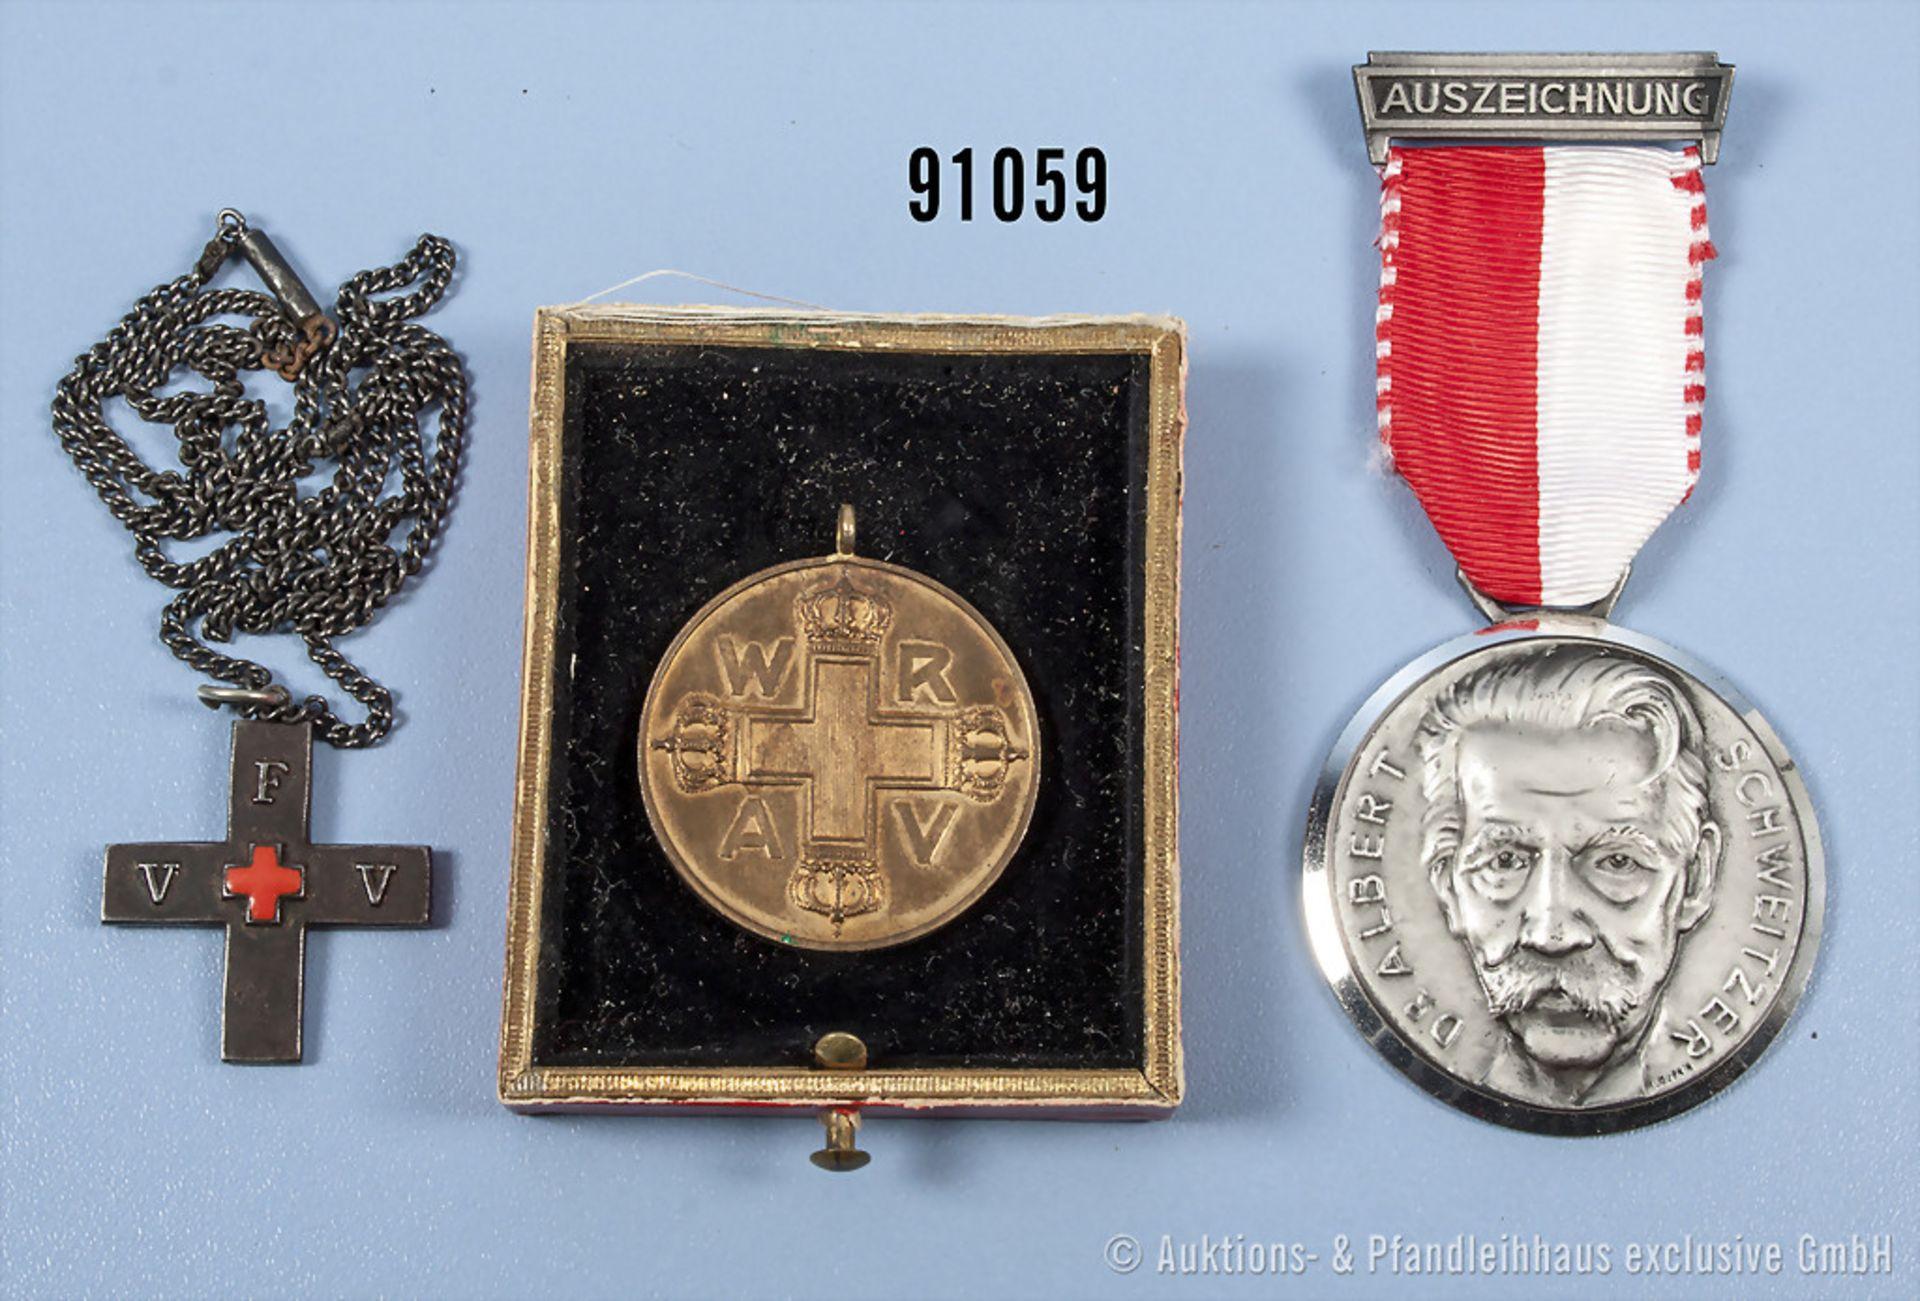 Konv. Preußen Rot-Kreuz-Medaille 3. Klasse, ohne Bandring, beschädigtes Etui, Eisenkreuz vom